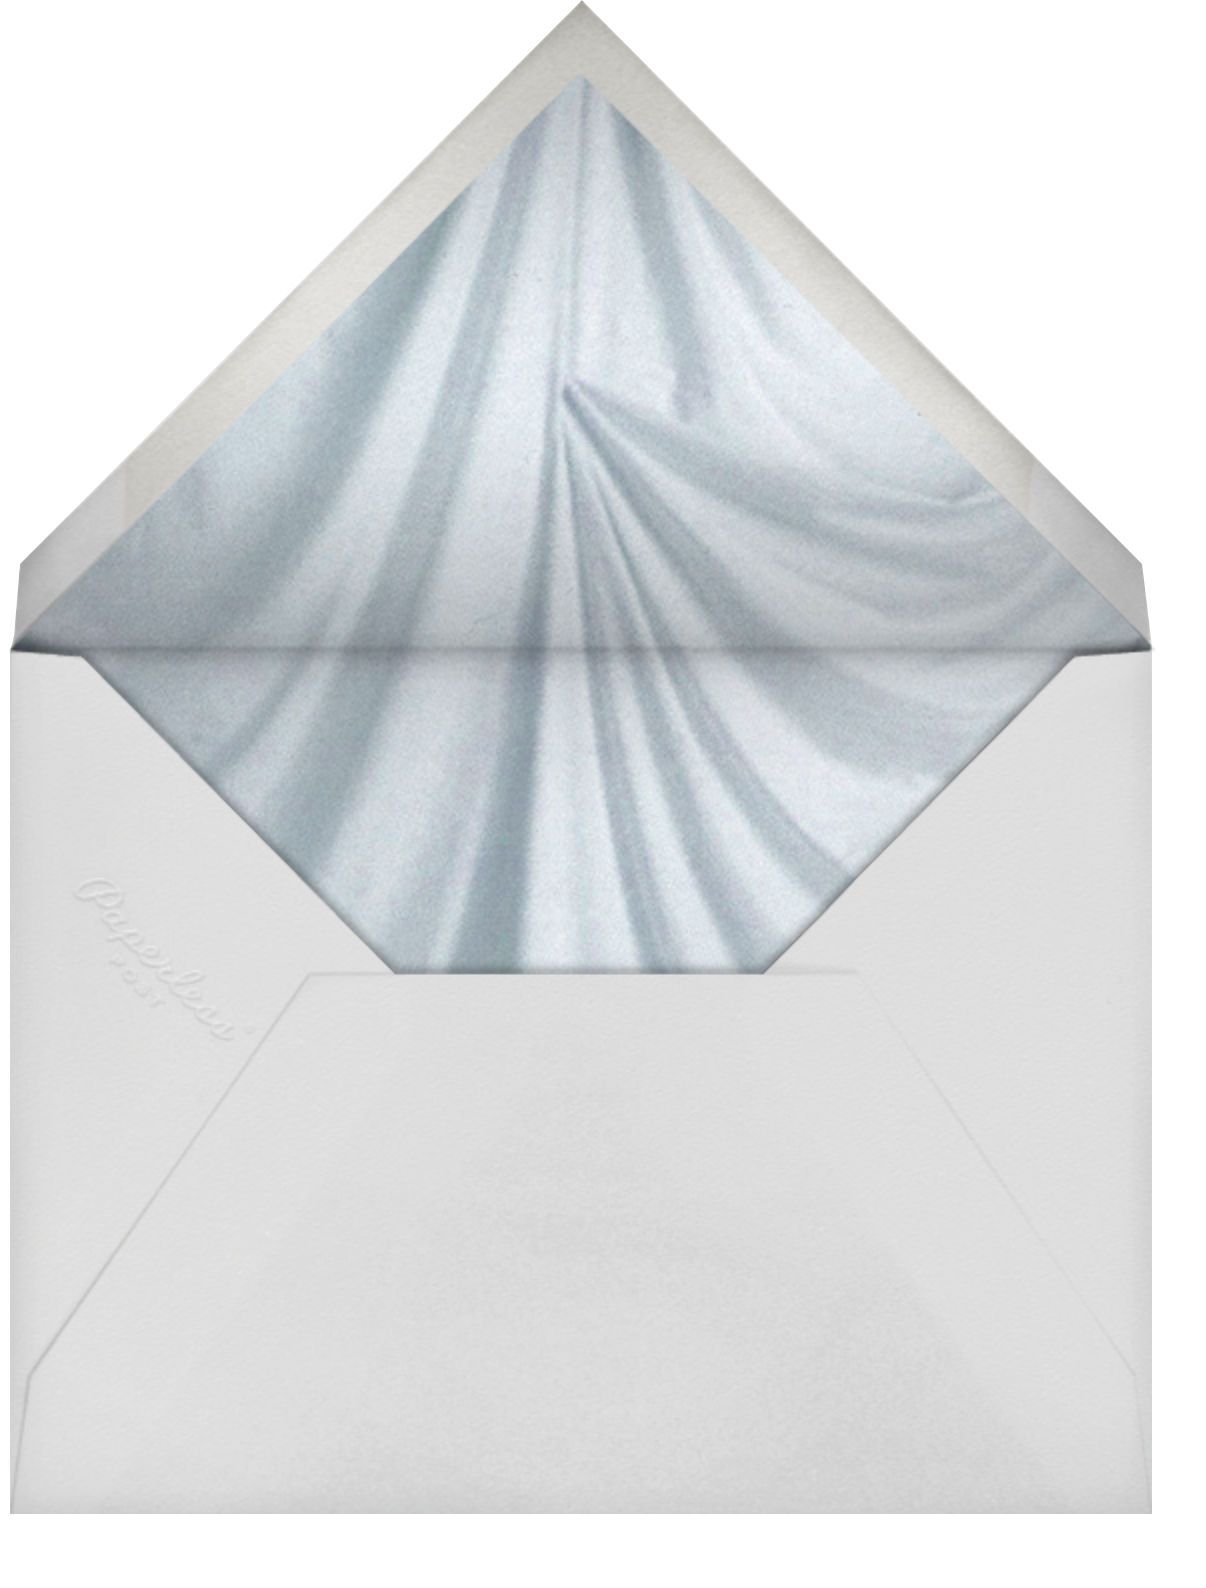 Beau - Nude - Kelly Wearstler - Featured designers - envelope back